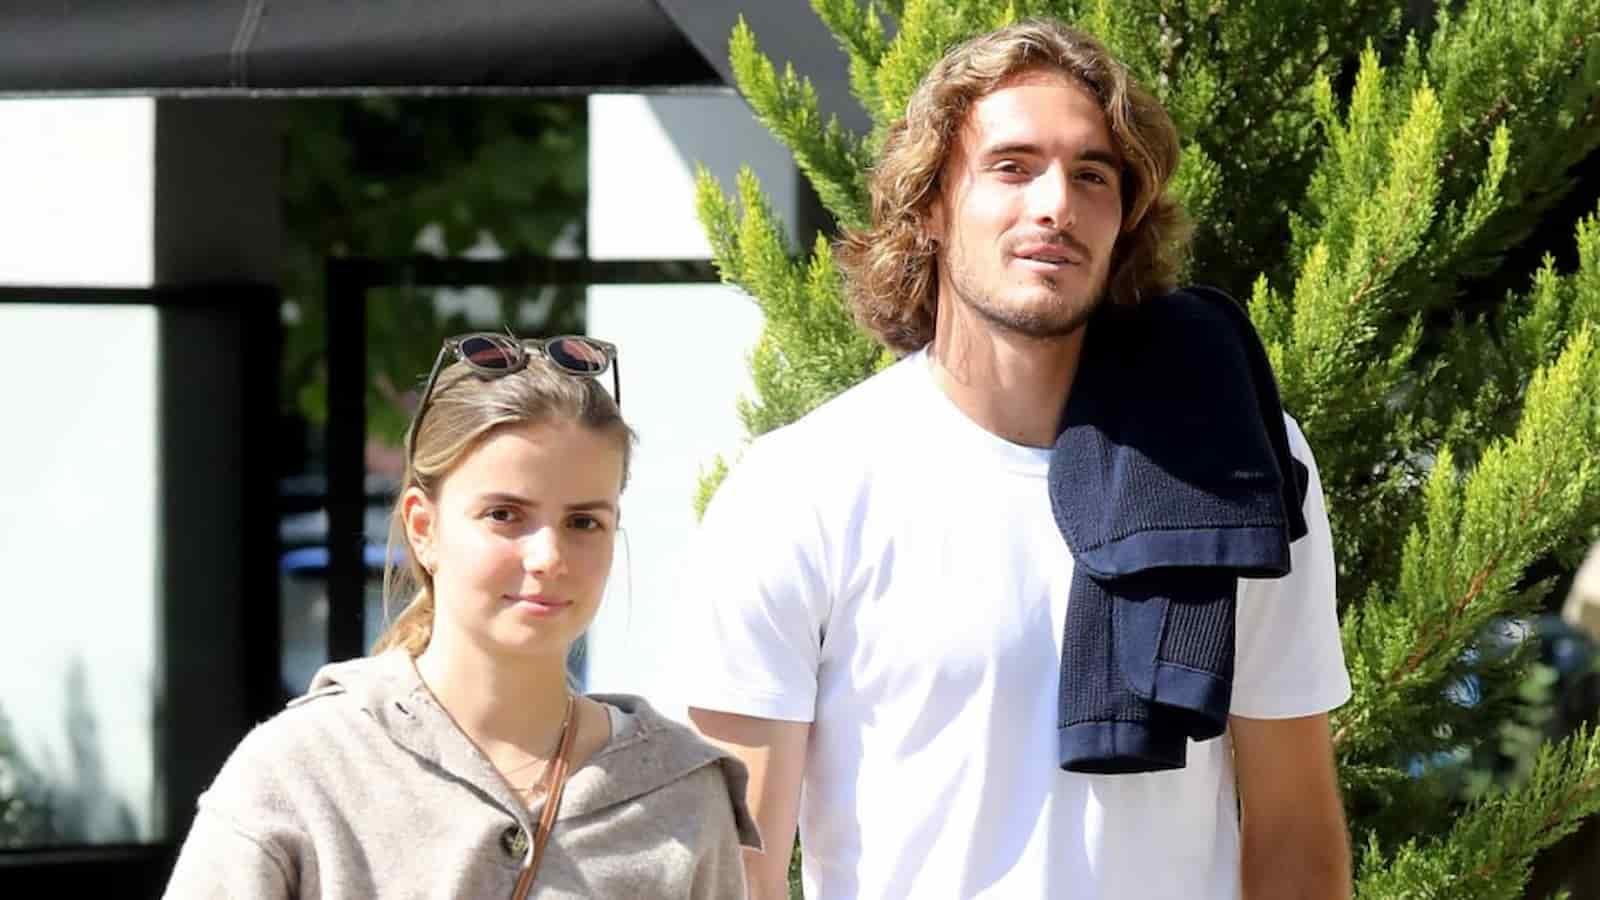 Who is Stefanos Tsitsipas' girlfriend, Theodora Petalas? Wiki, bio